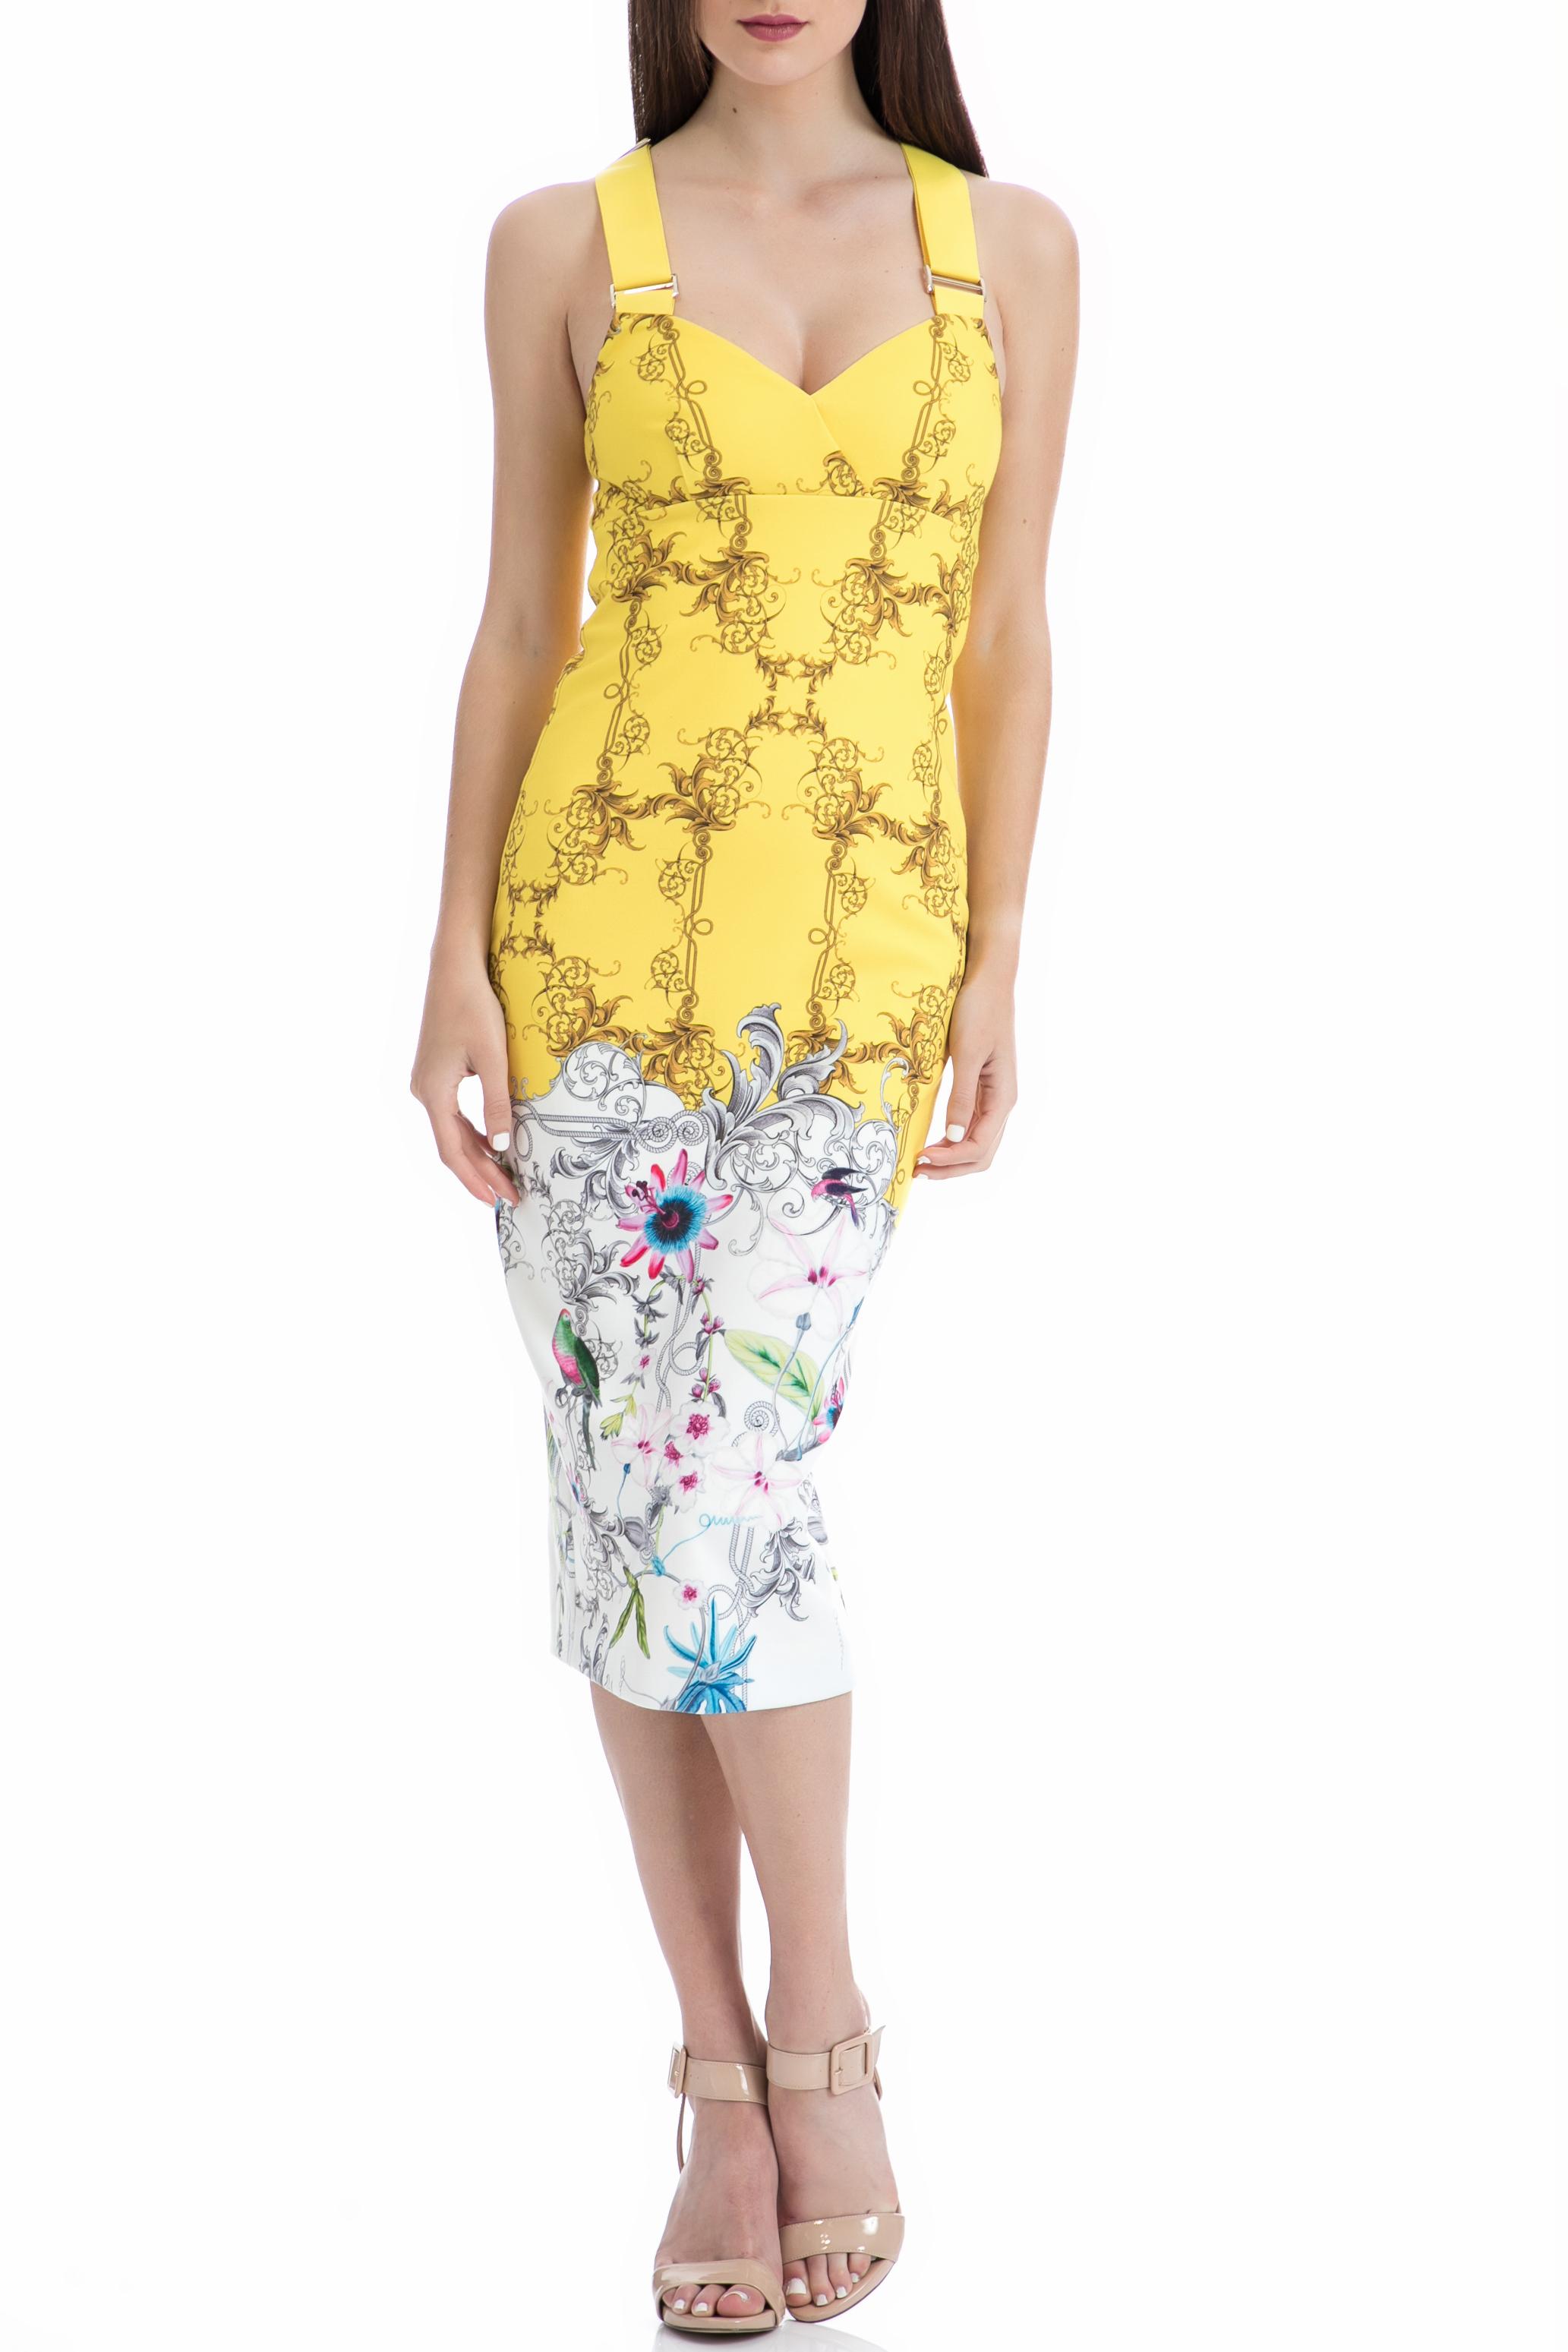 TED BAKER - Γυναικείο φόρεμα Ted Baker κίτρινο-λευκό γυναικεία ρούχα φορέματα μέχρι το γόνατο